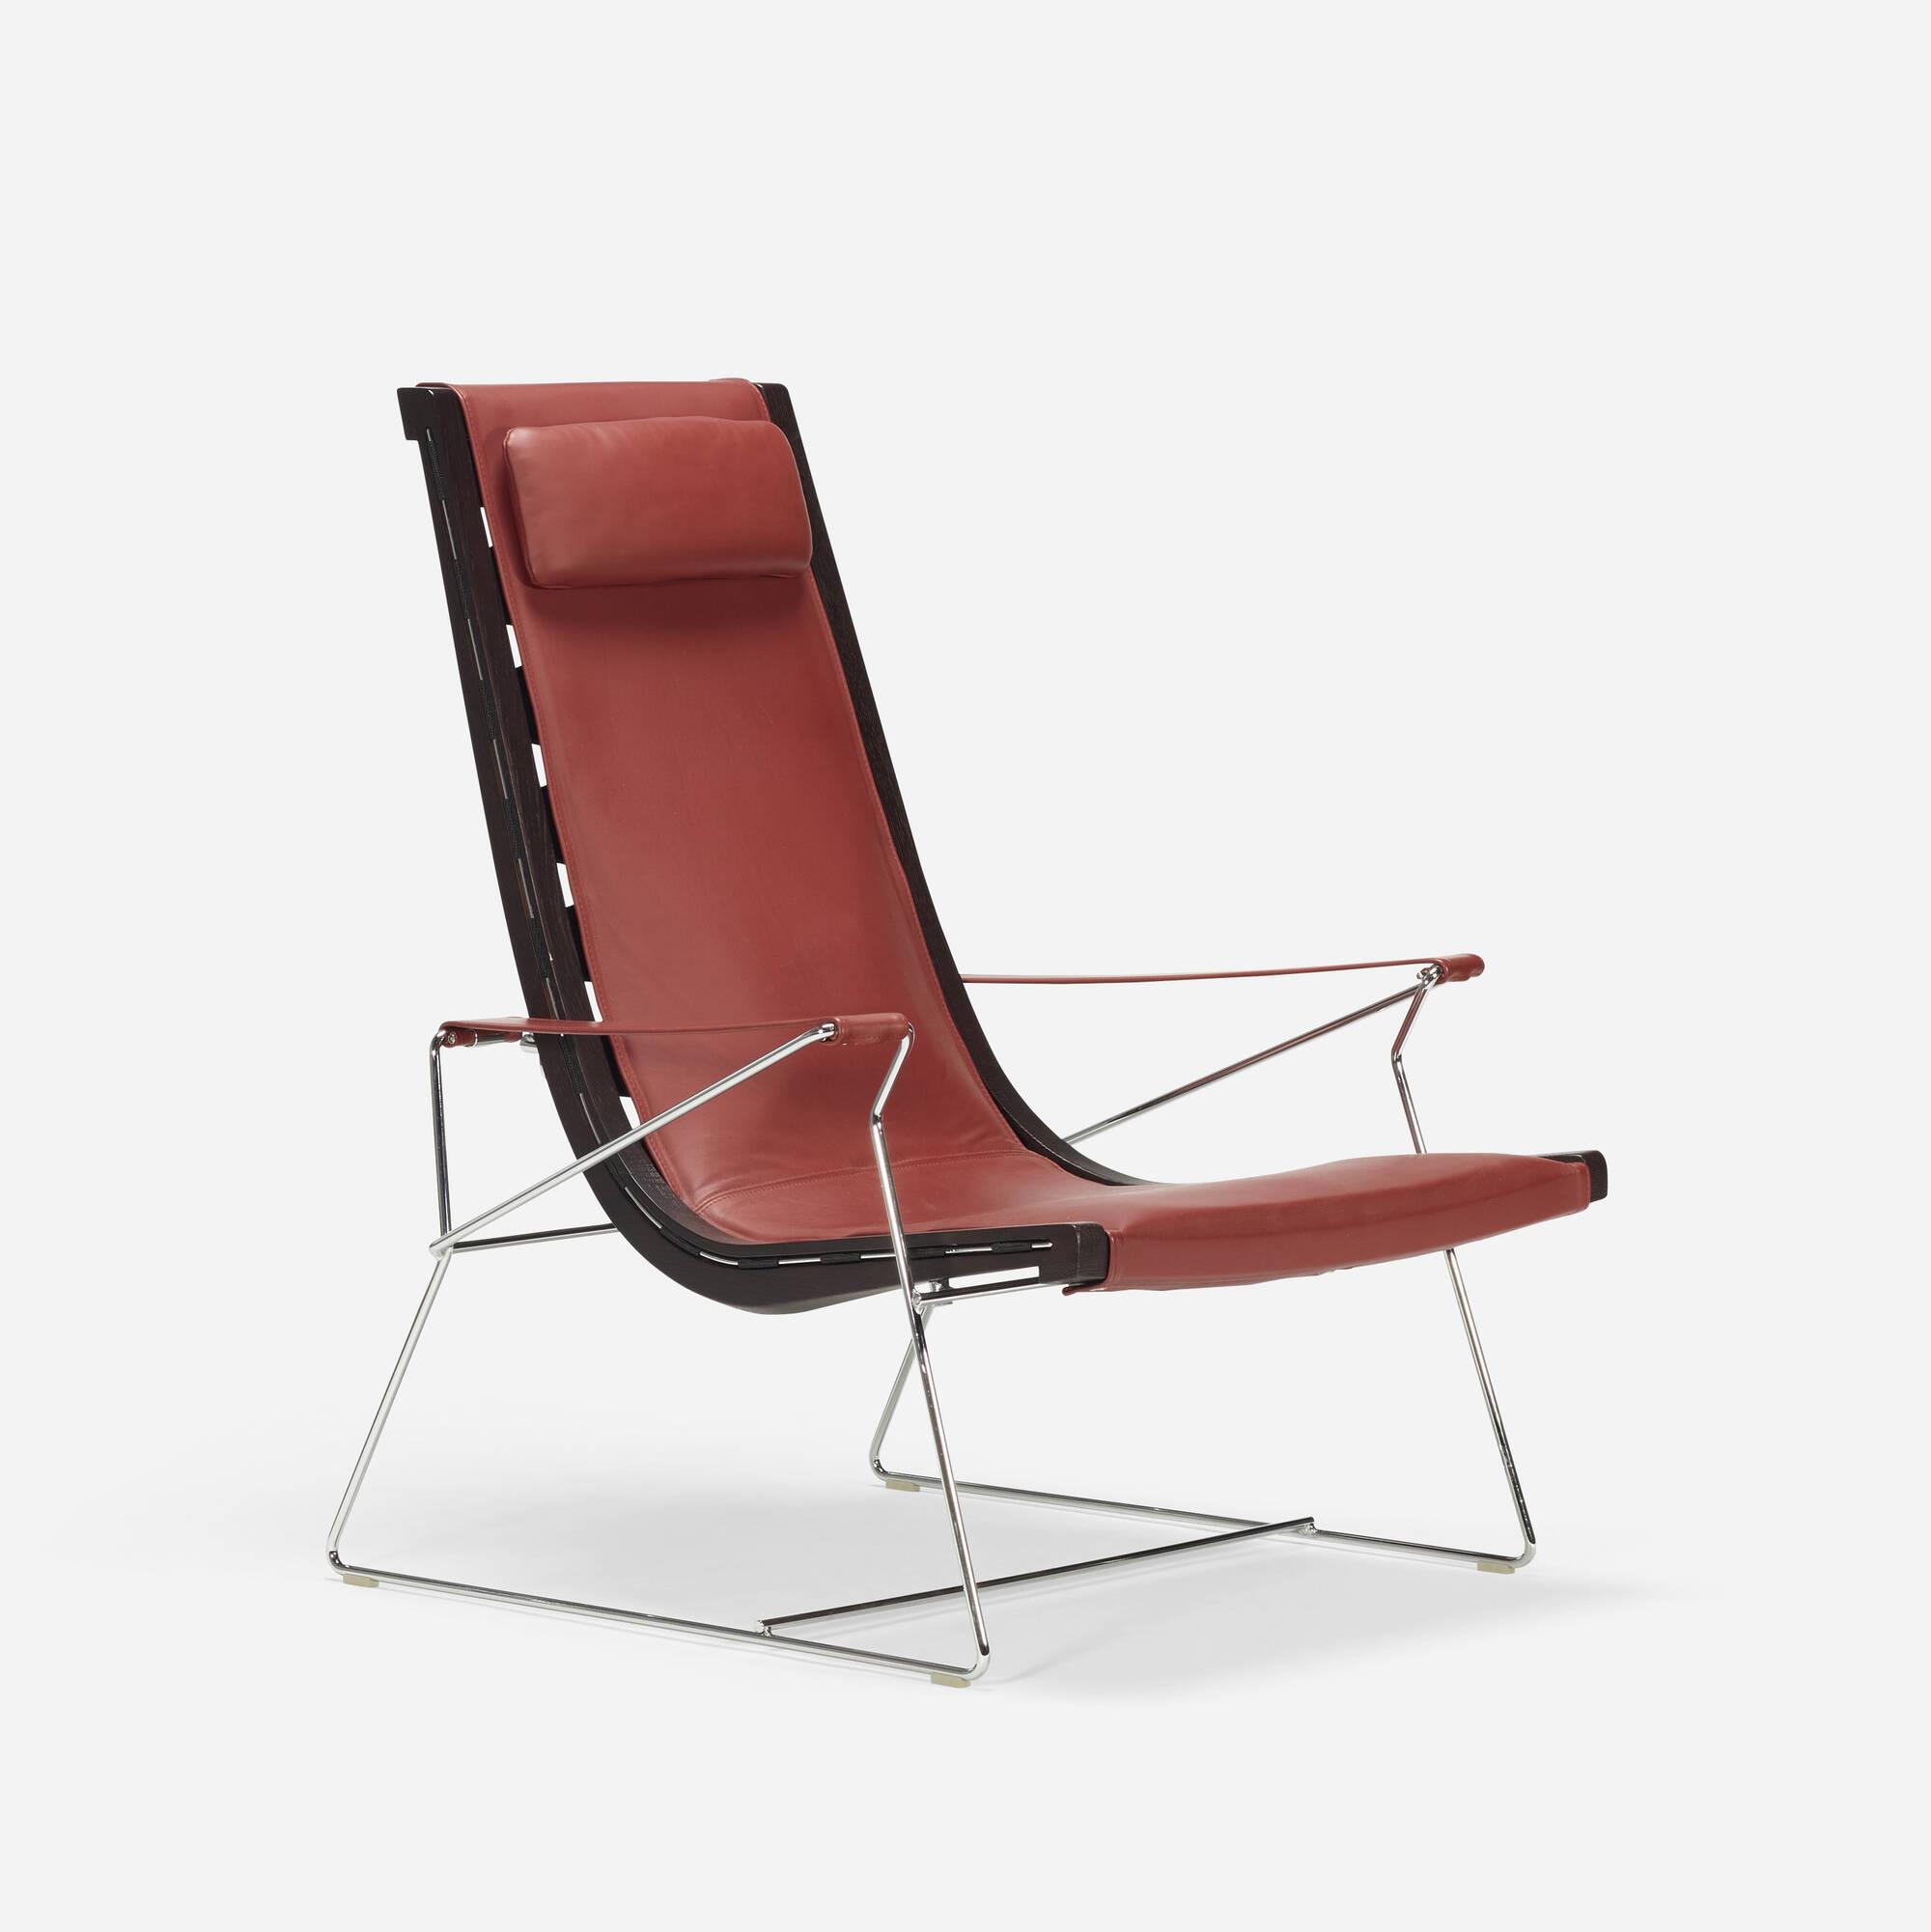 206: Antonio Citterio / J.J. armchair (1 of 3)